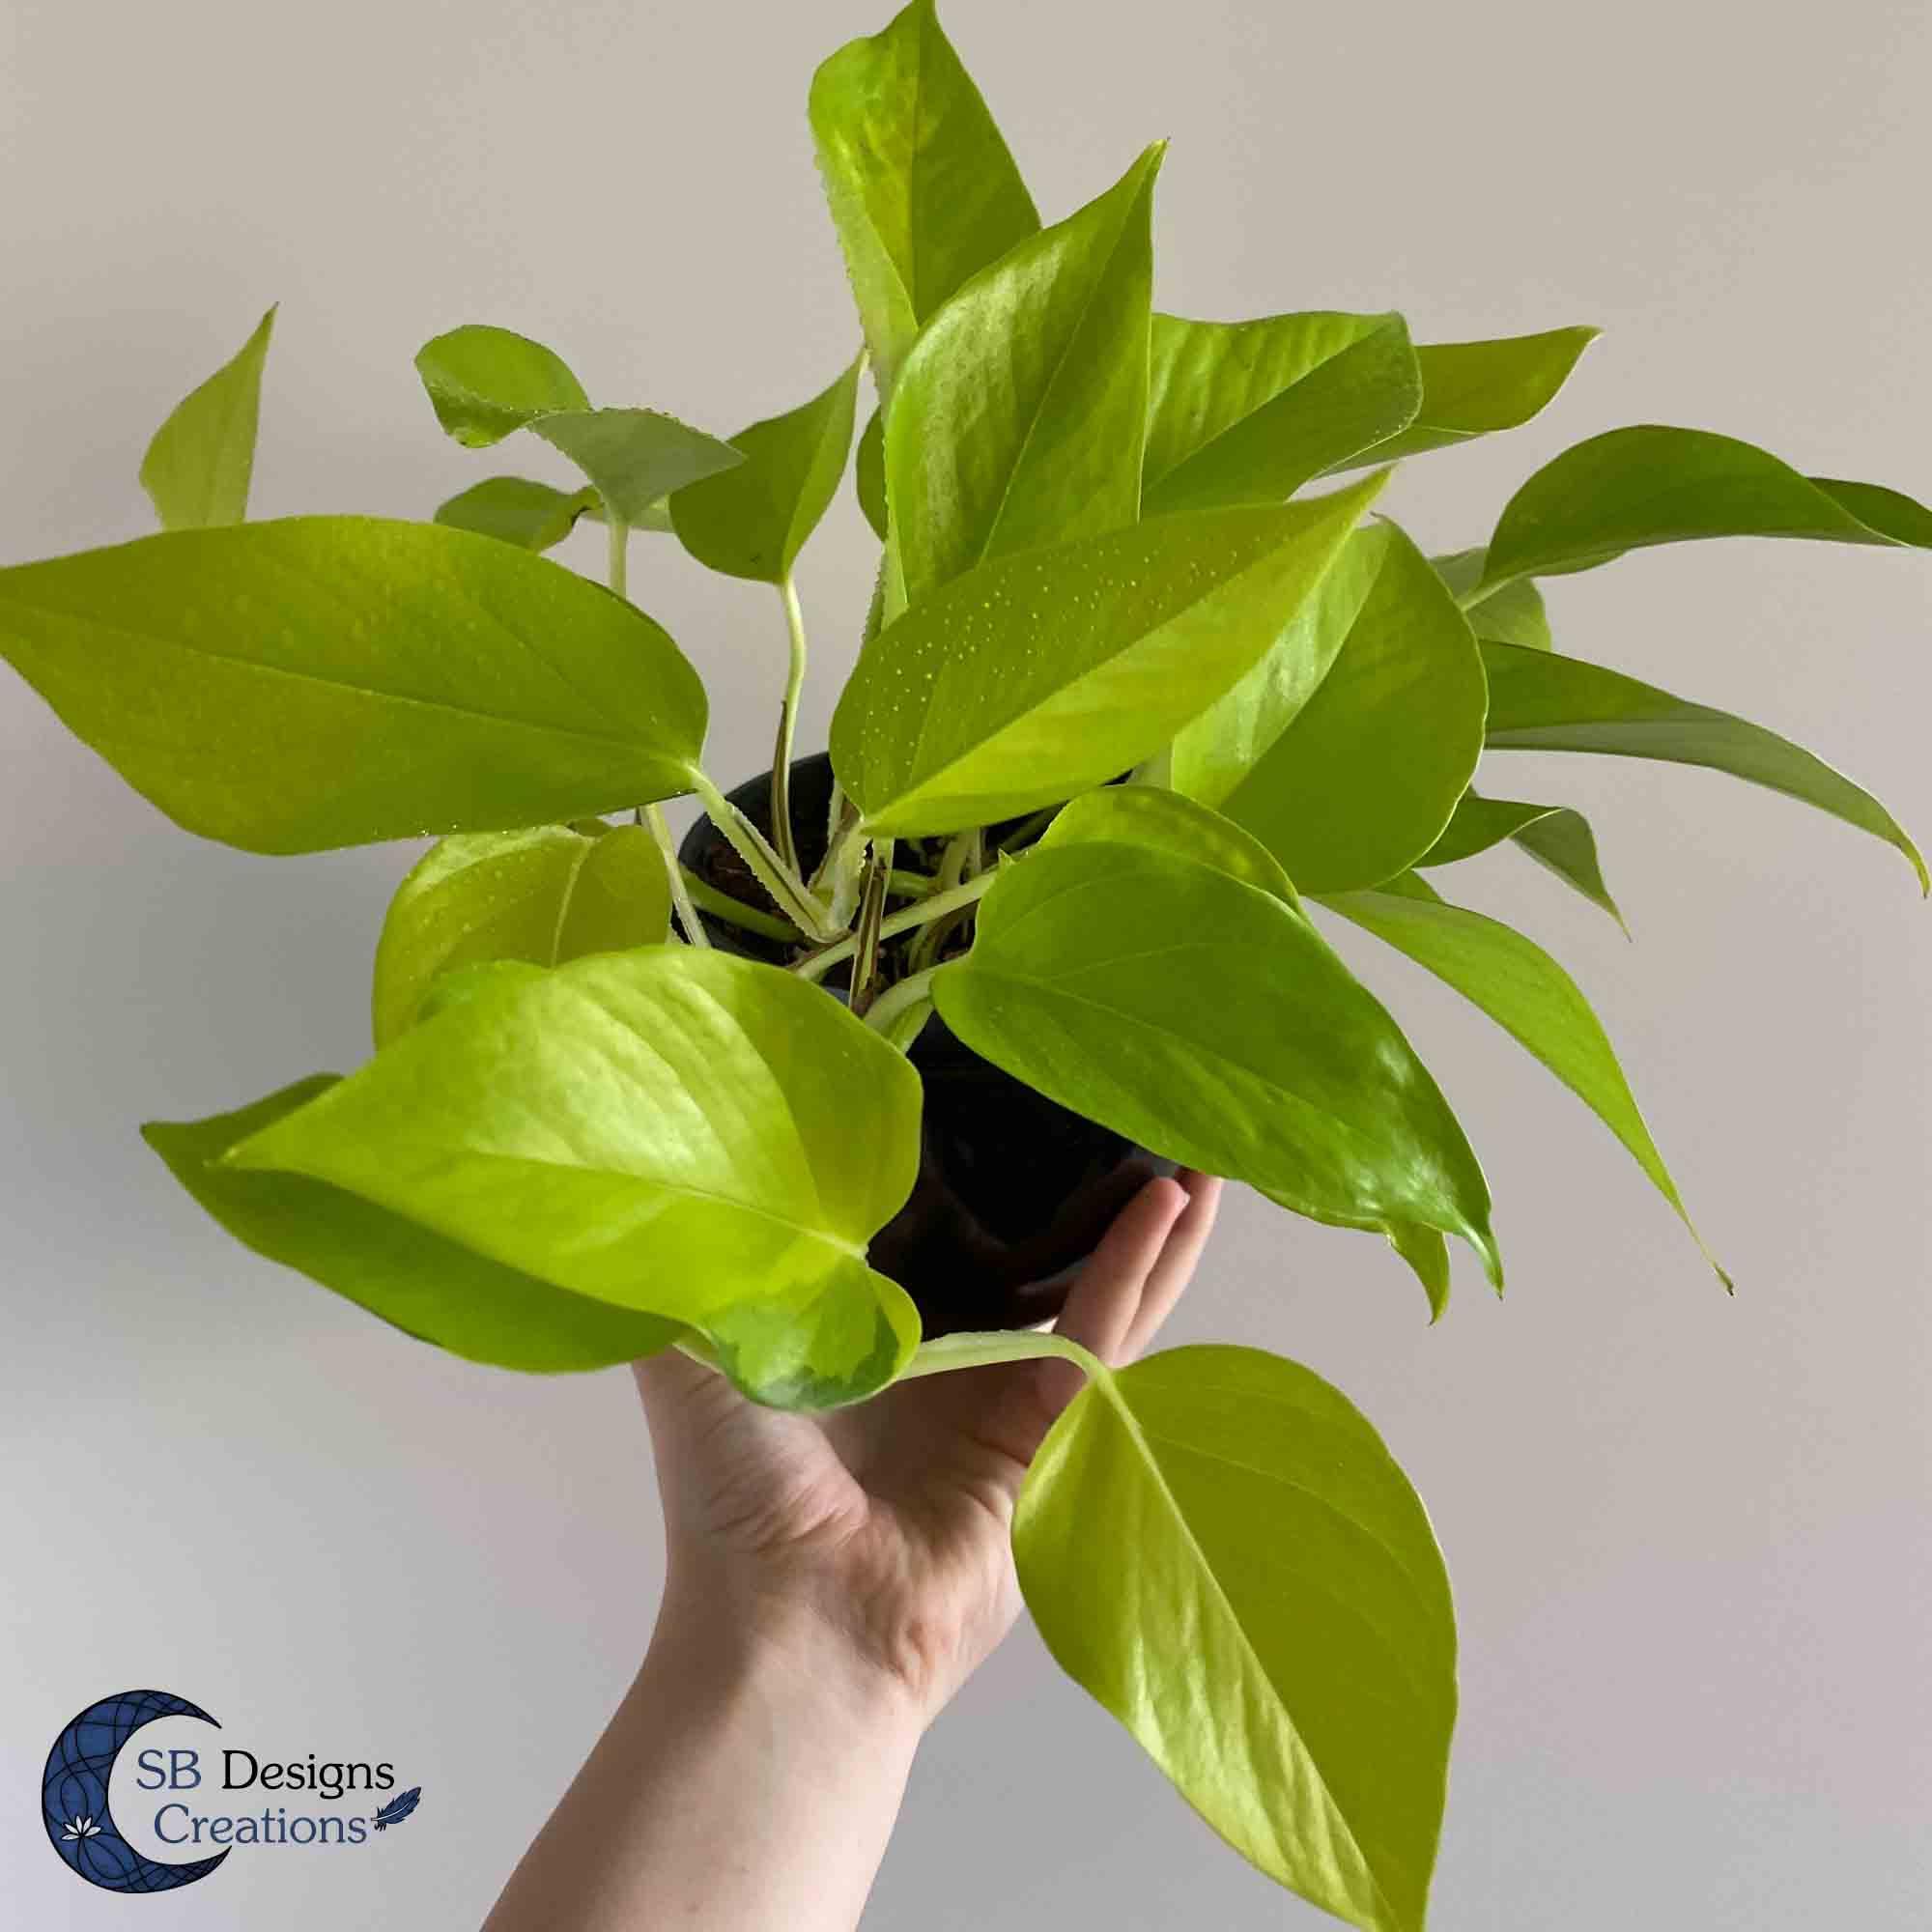 Kamerplanten-Houseplants-Inspiration-Vlog-7